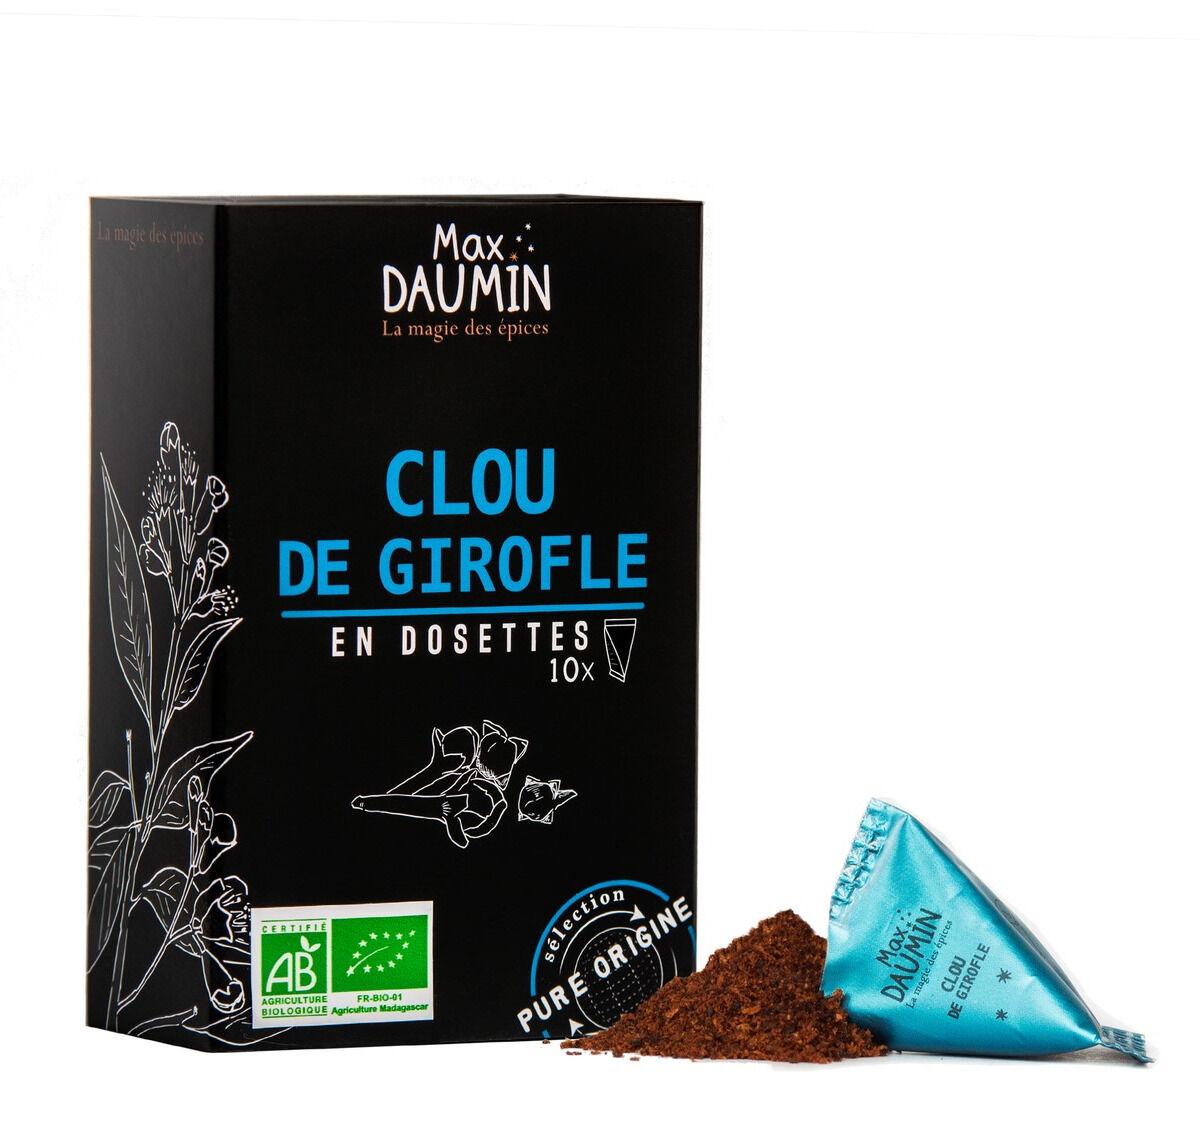 Epices Max Daumin Clou De Girofle Bio